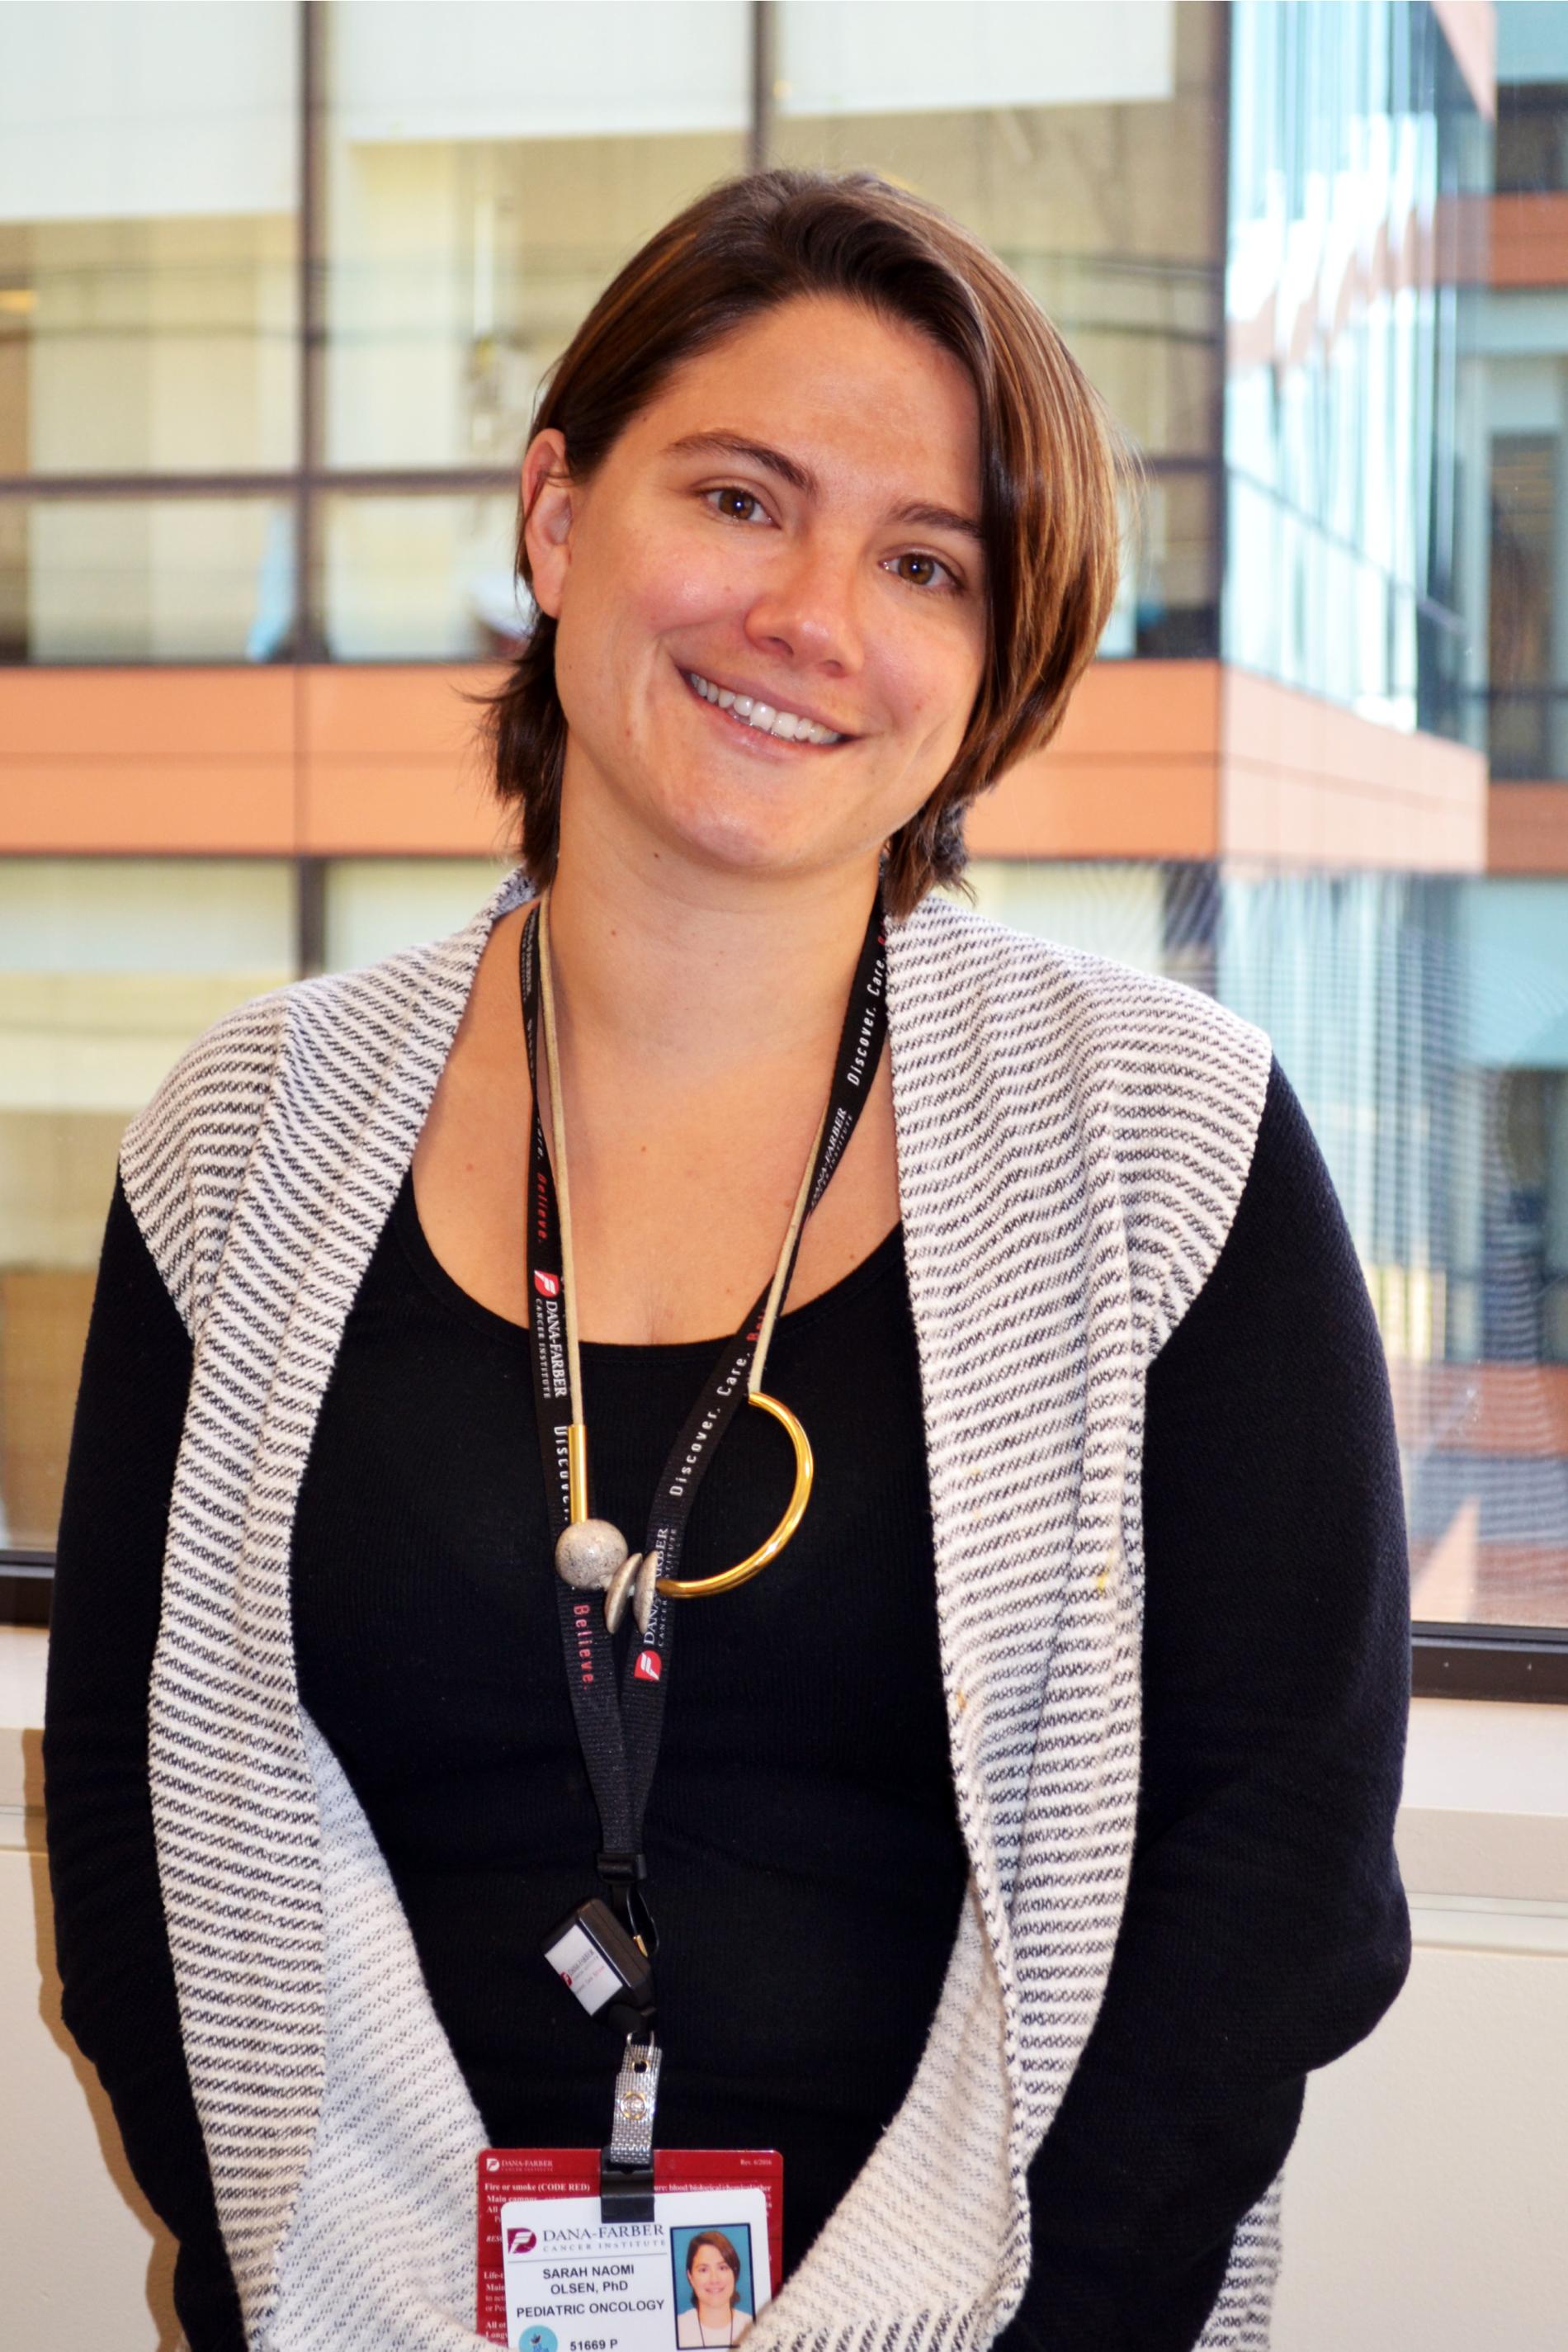 Naomi Olsen, PhD - Research Fellow